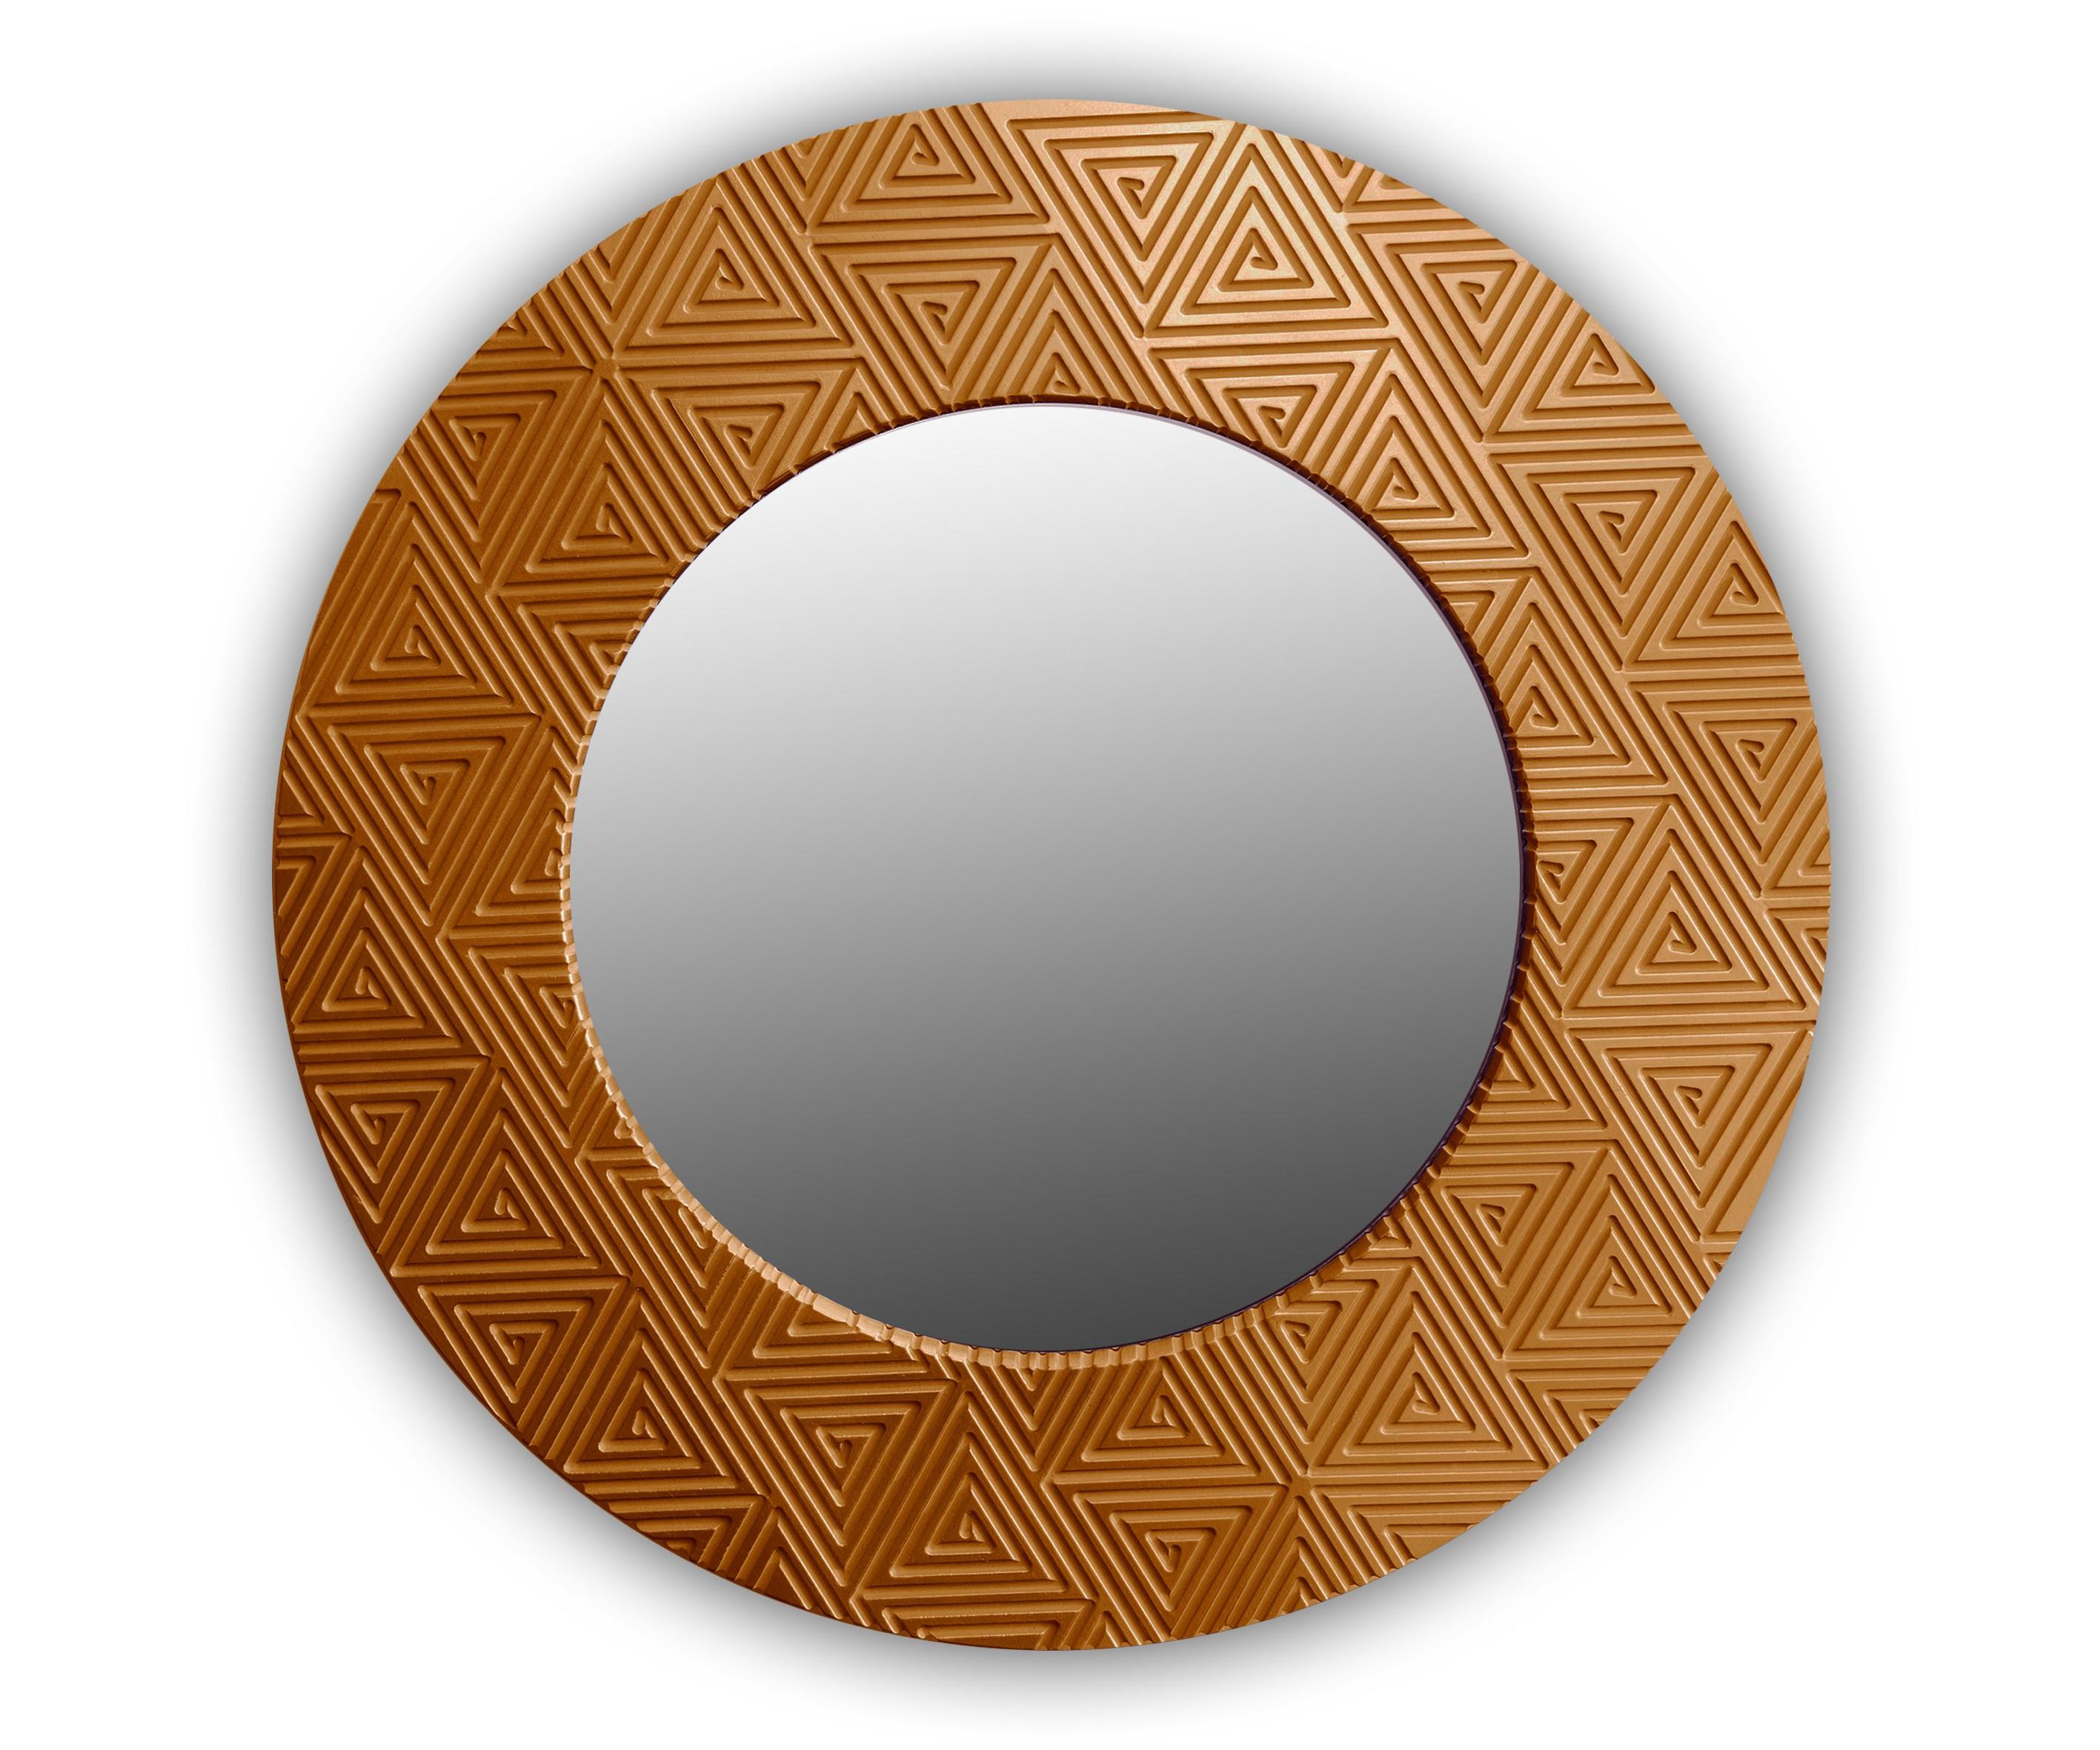 Зеркало PyramidНастенные зеркала<br><br><br>Material: Дерево<br>Глубина см: 4